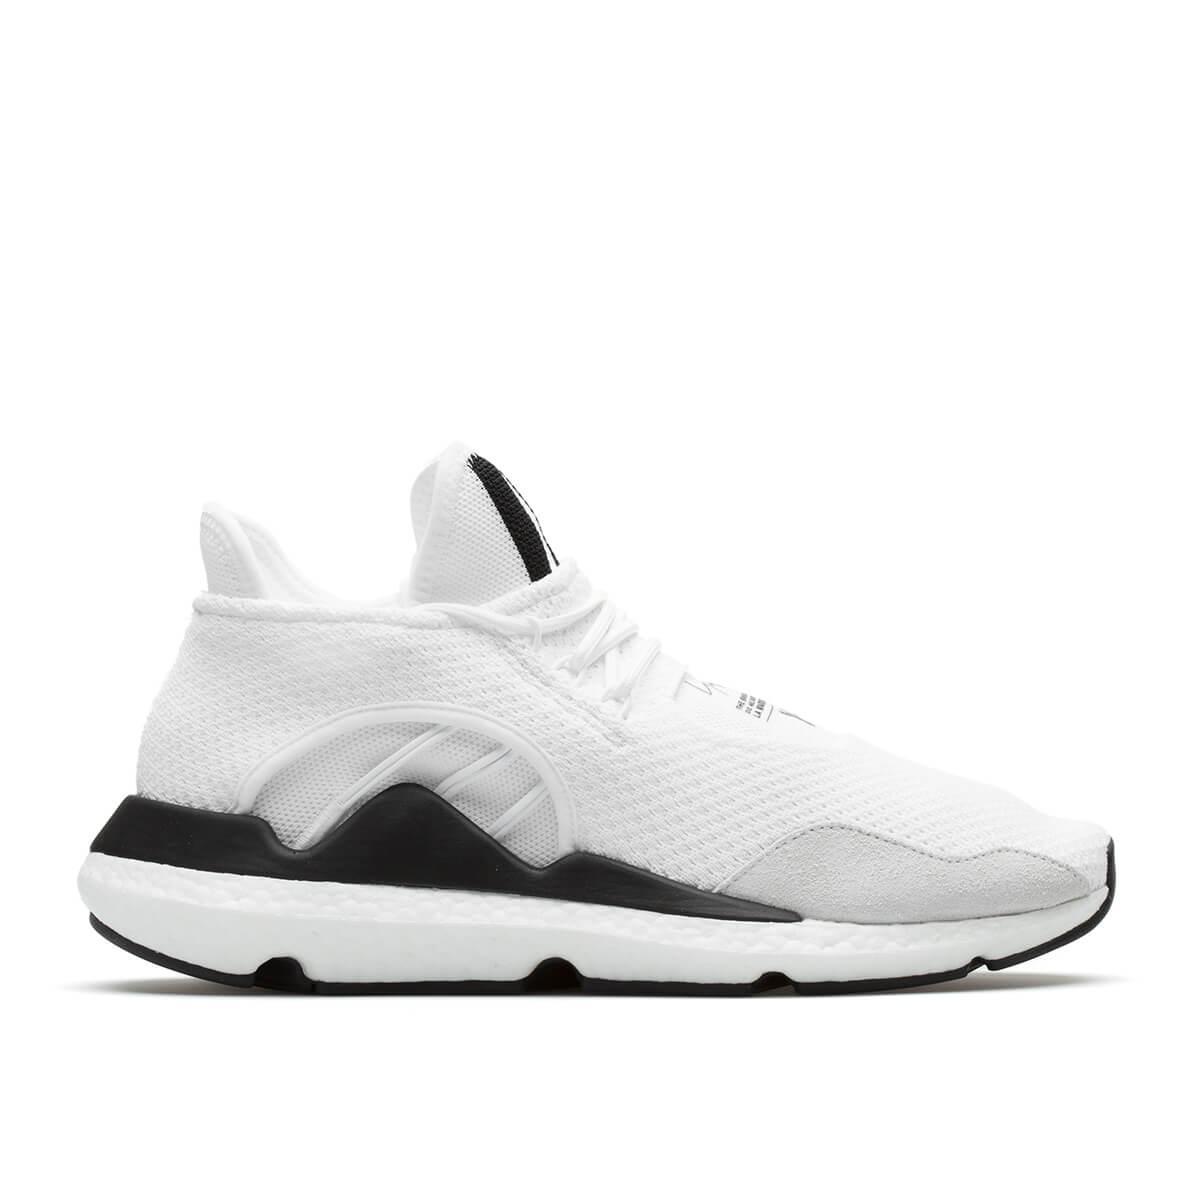 Y-3 Designer Shoes, Core Saikou Sneakers